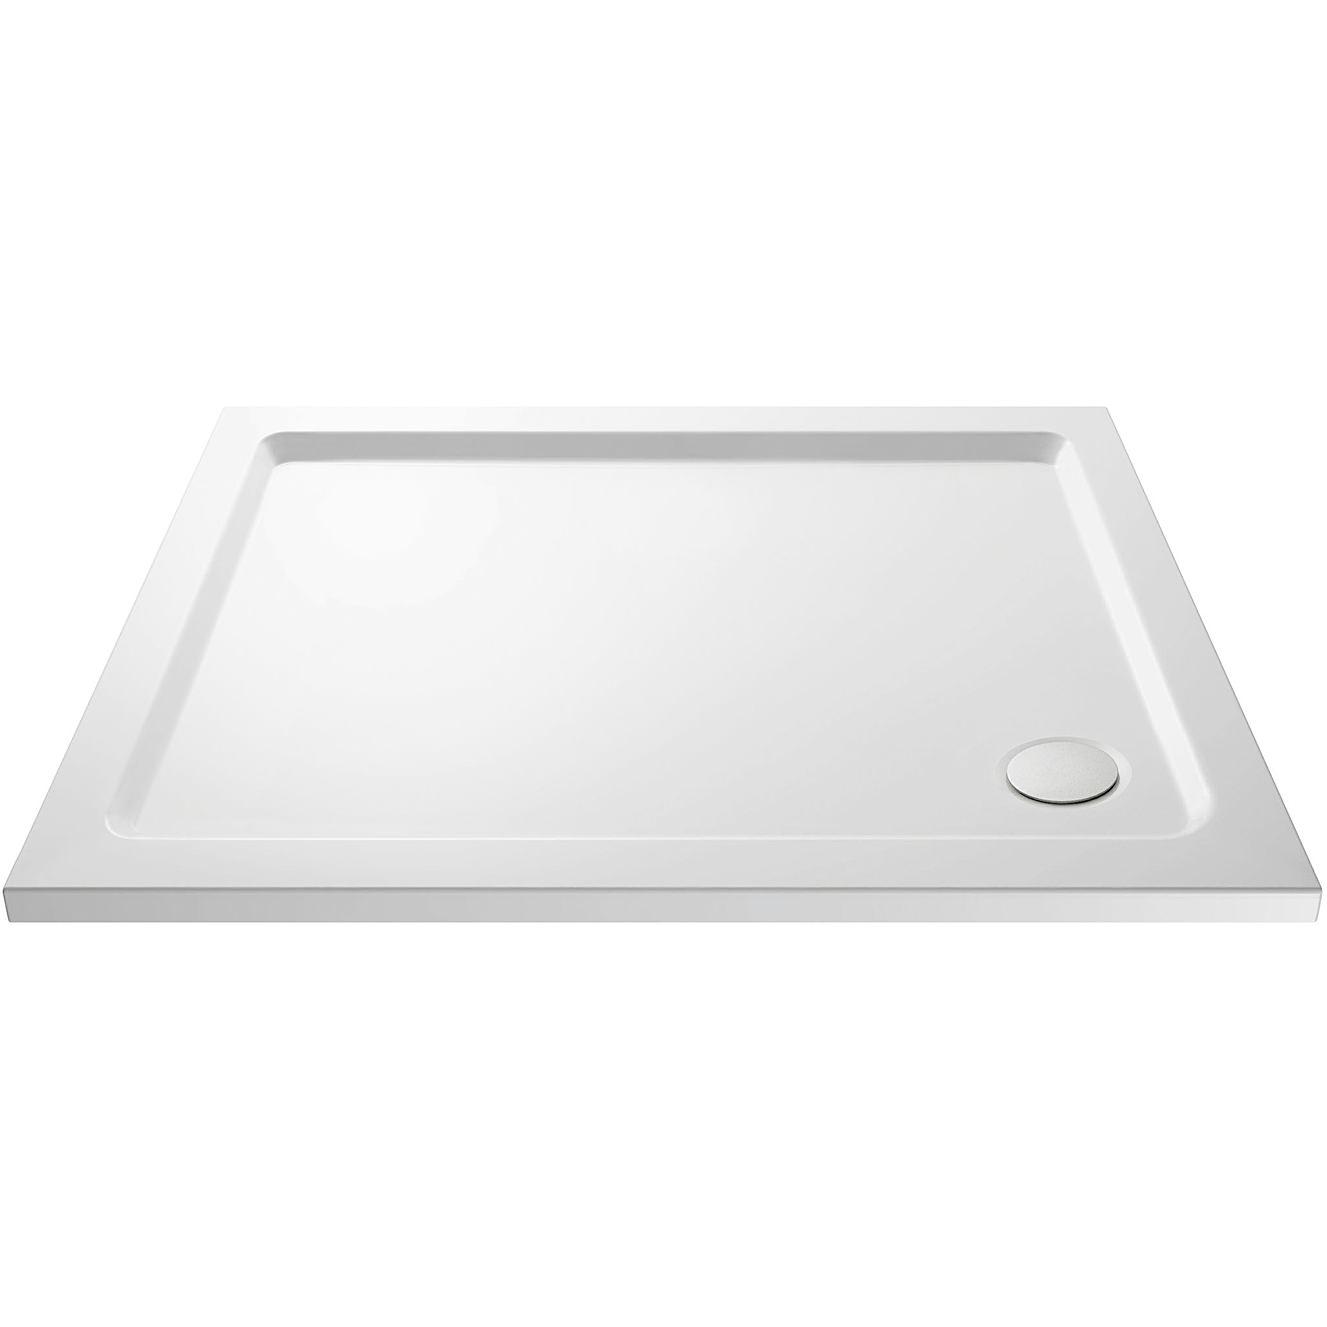 Lauren Pearlstone Rectangular Shower Tray | NTP007